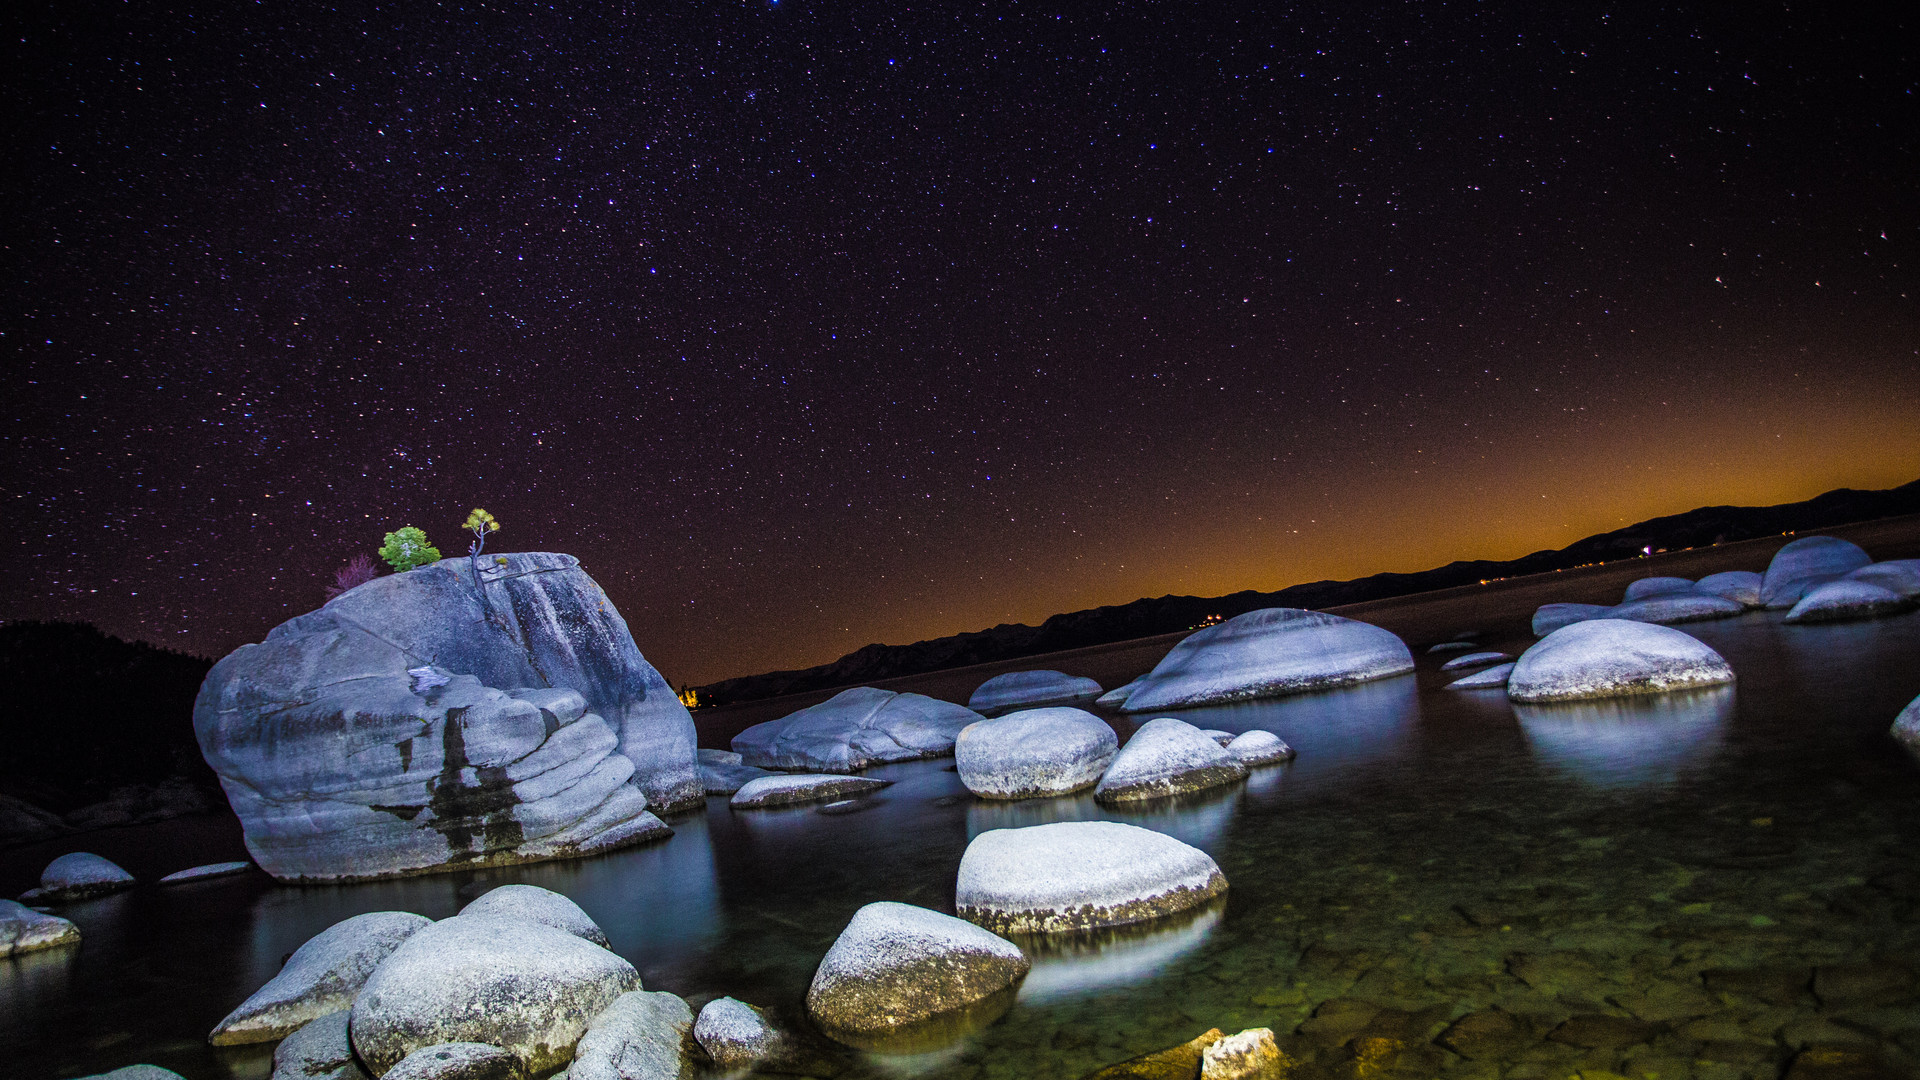 Bonsai Rock, Tahoe